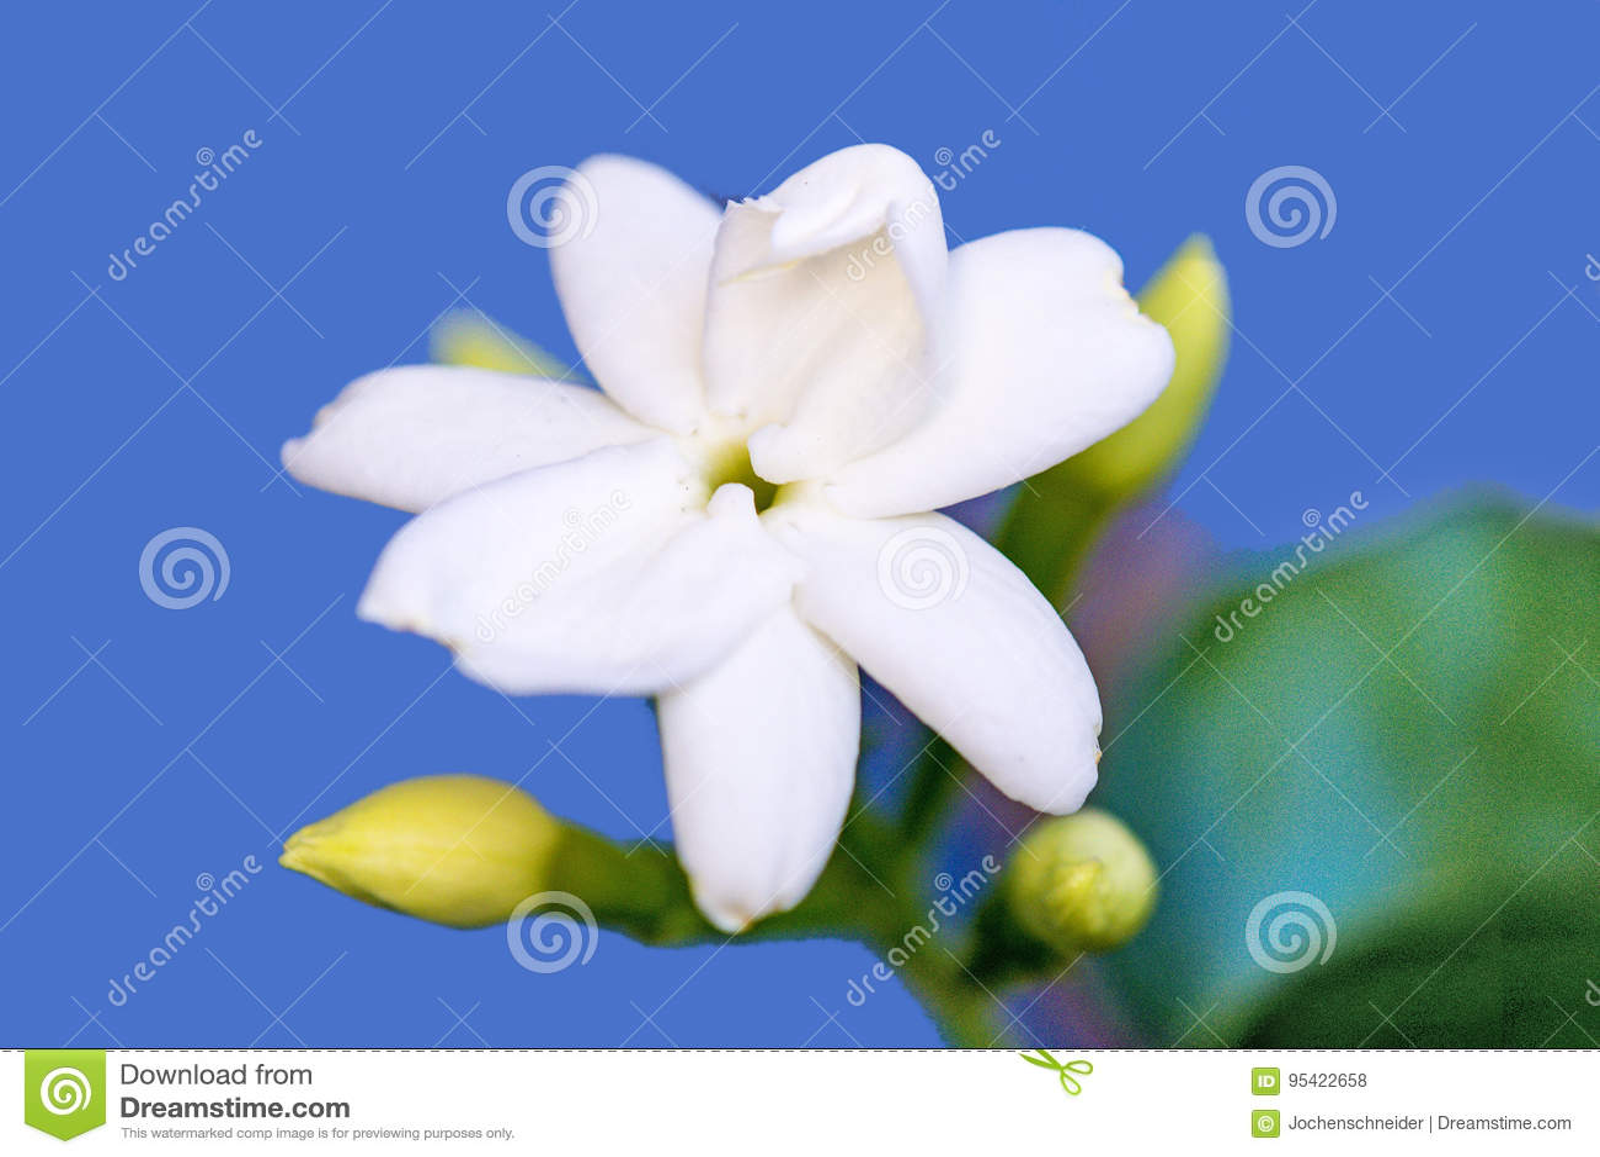 Common jasmine flower closeup stock photo image of flower common jasmine flower closeup of the perfume plant izmirmasajfo